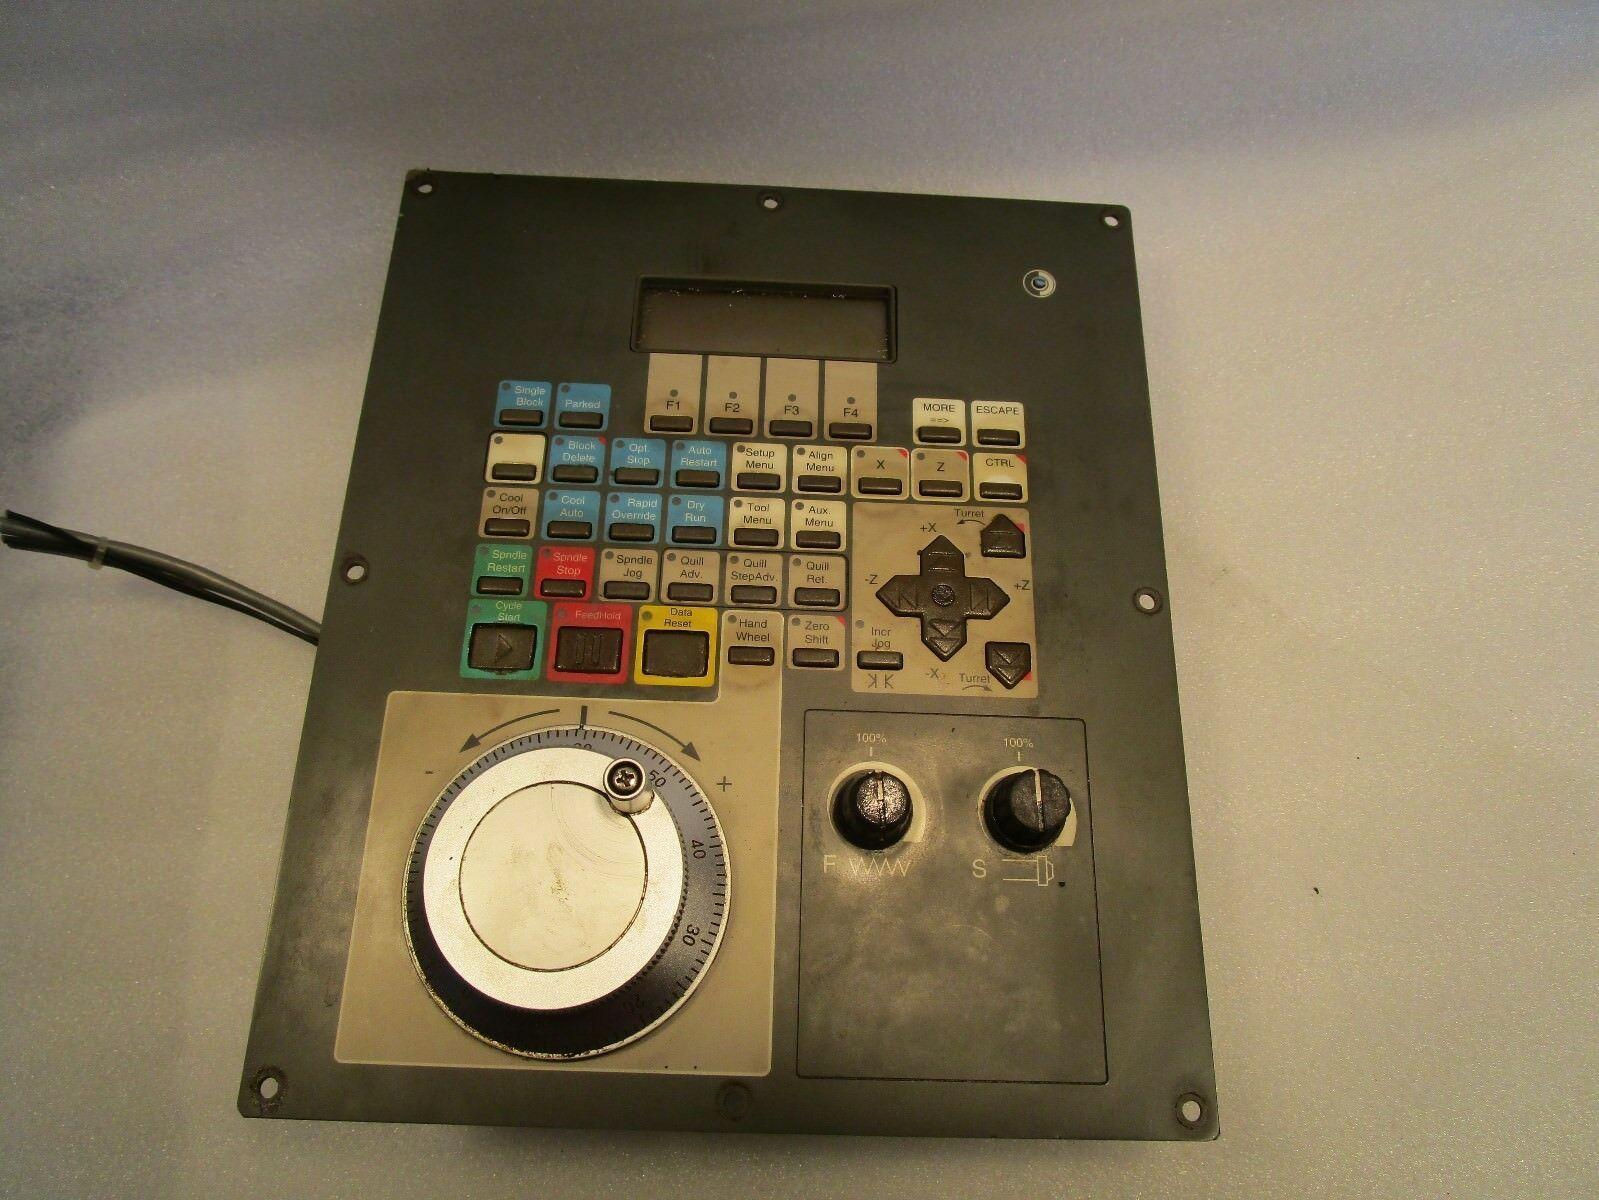 Cincinnati Lathe Operator Interface with MPG 3-424-2185A Rev B